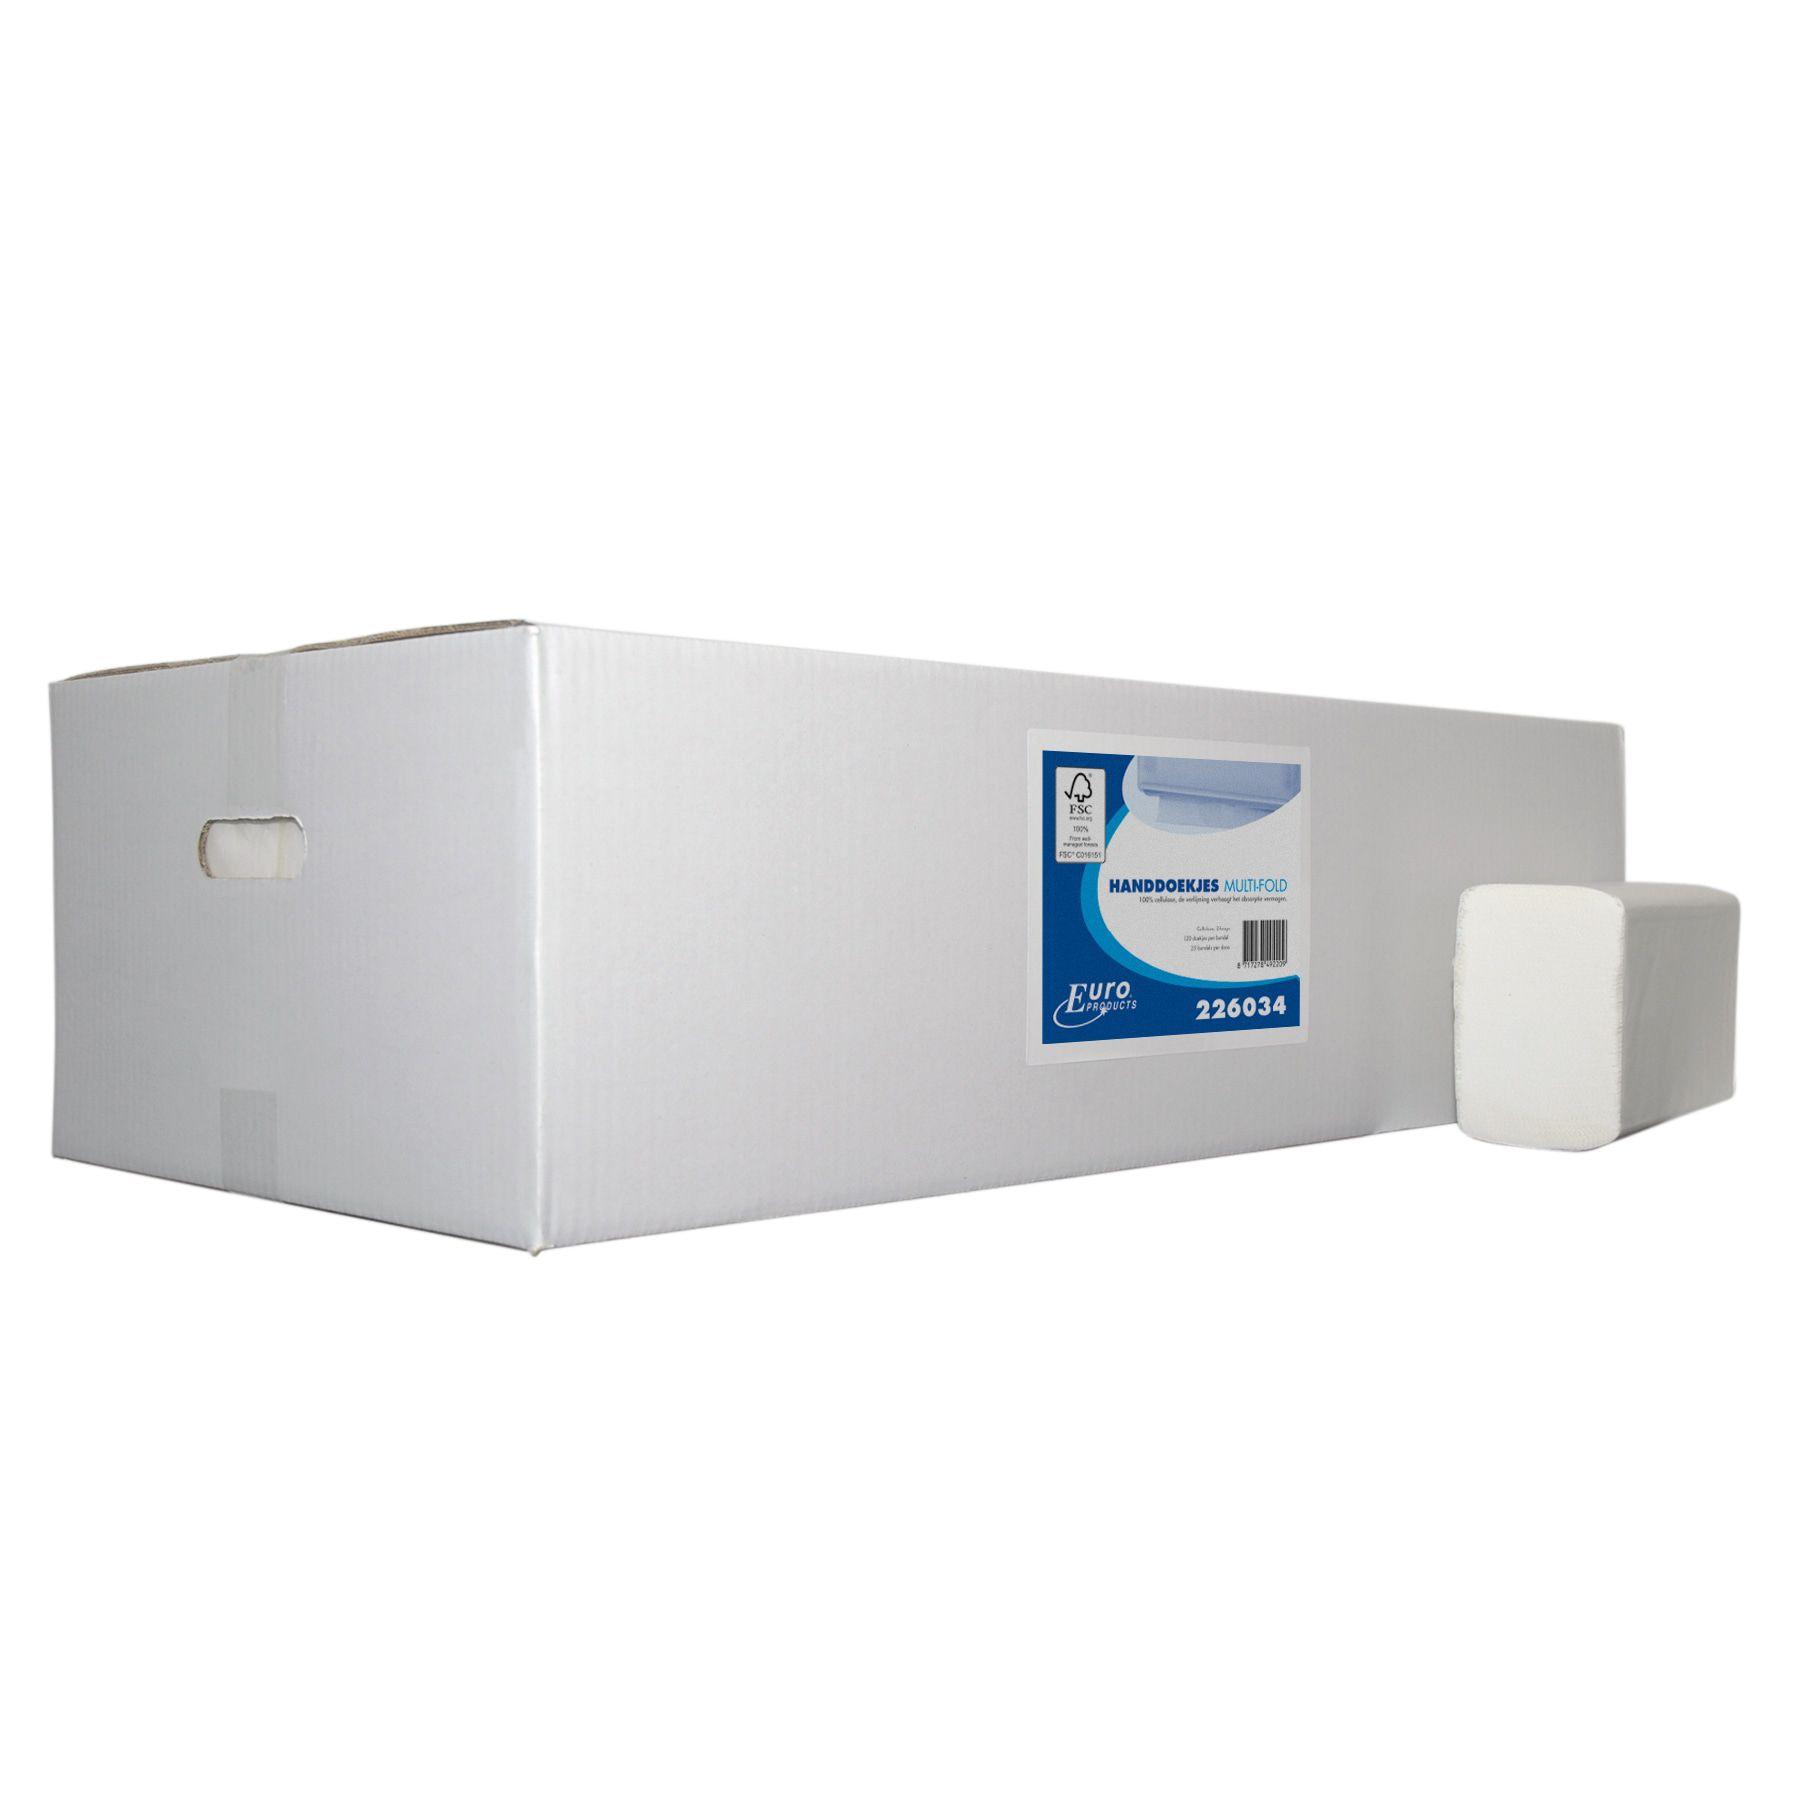 Papieren Handdoeken 226034 Multifold gevouwen 32x20.6cm 2laags 3000st (226034)